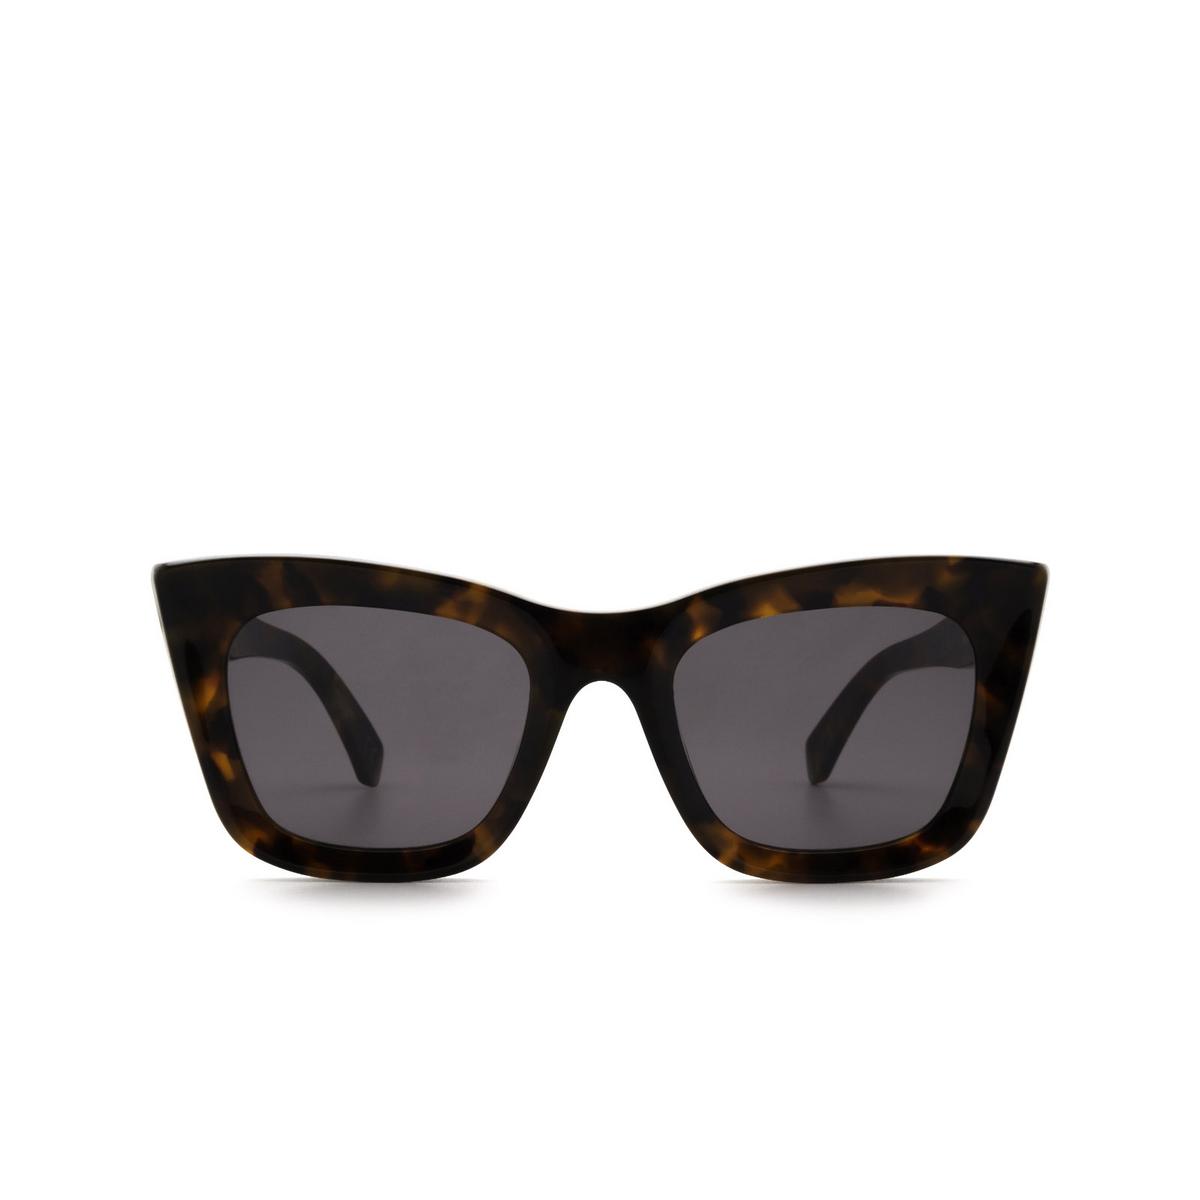 Retrosuperfuture® Square Sunglasses: Oltre color Classic Havana N0X - front view.